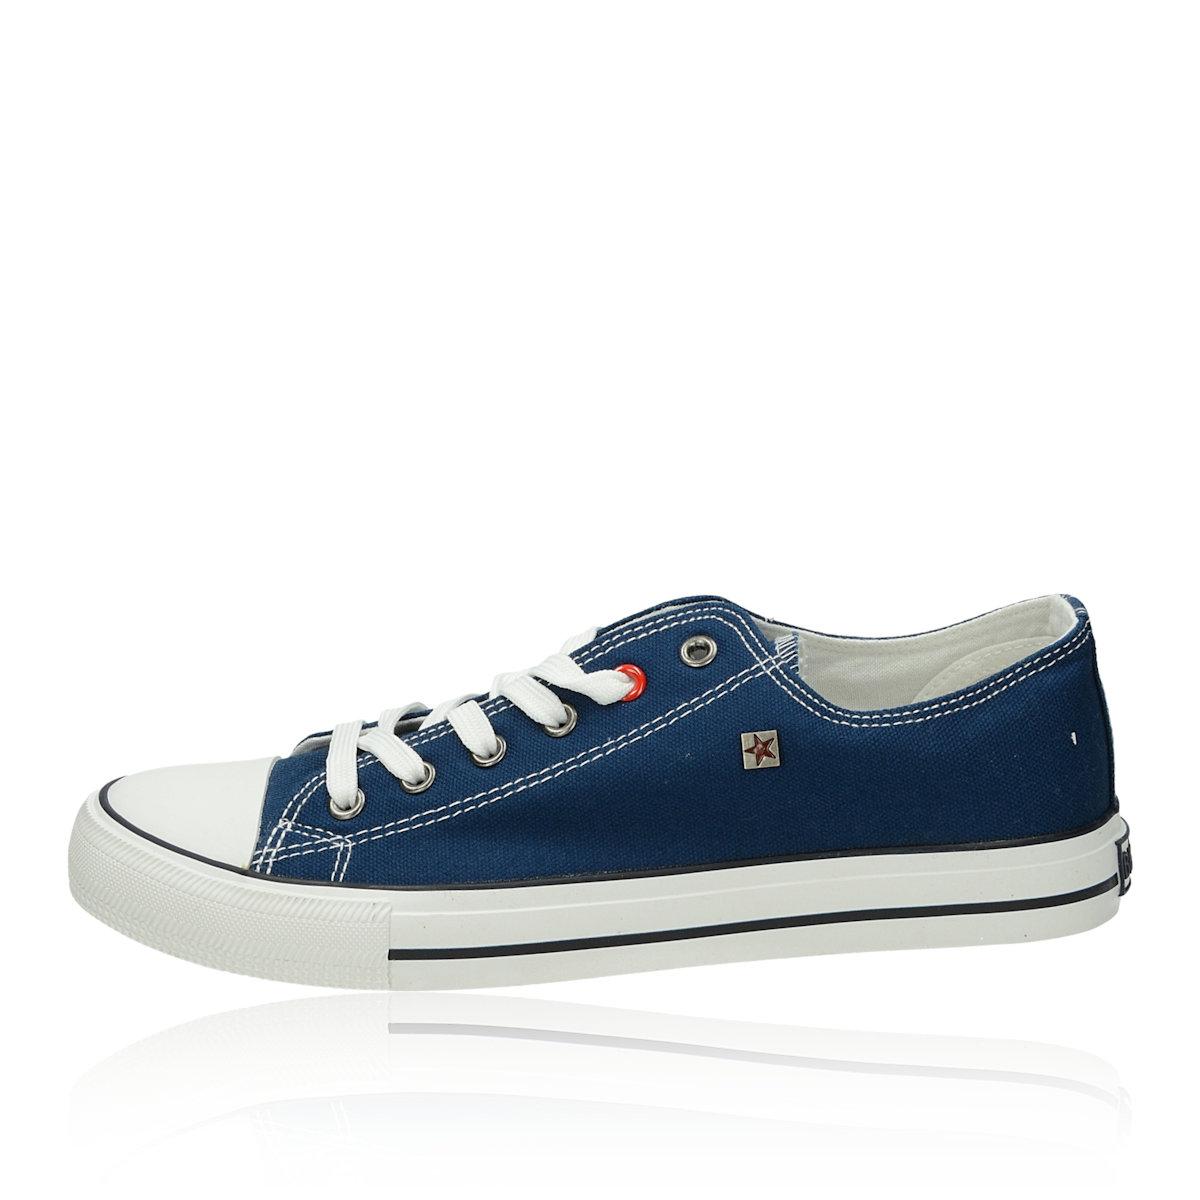 3685003f07ff0 Big Star pánske plátené tenisky - modré | T174101-NAVY www.robel.sk